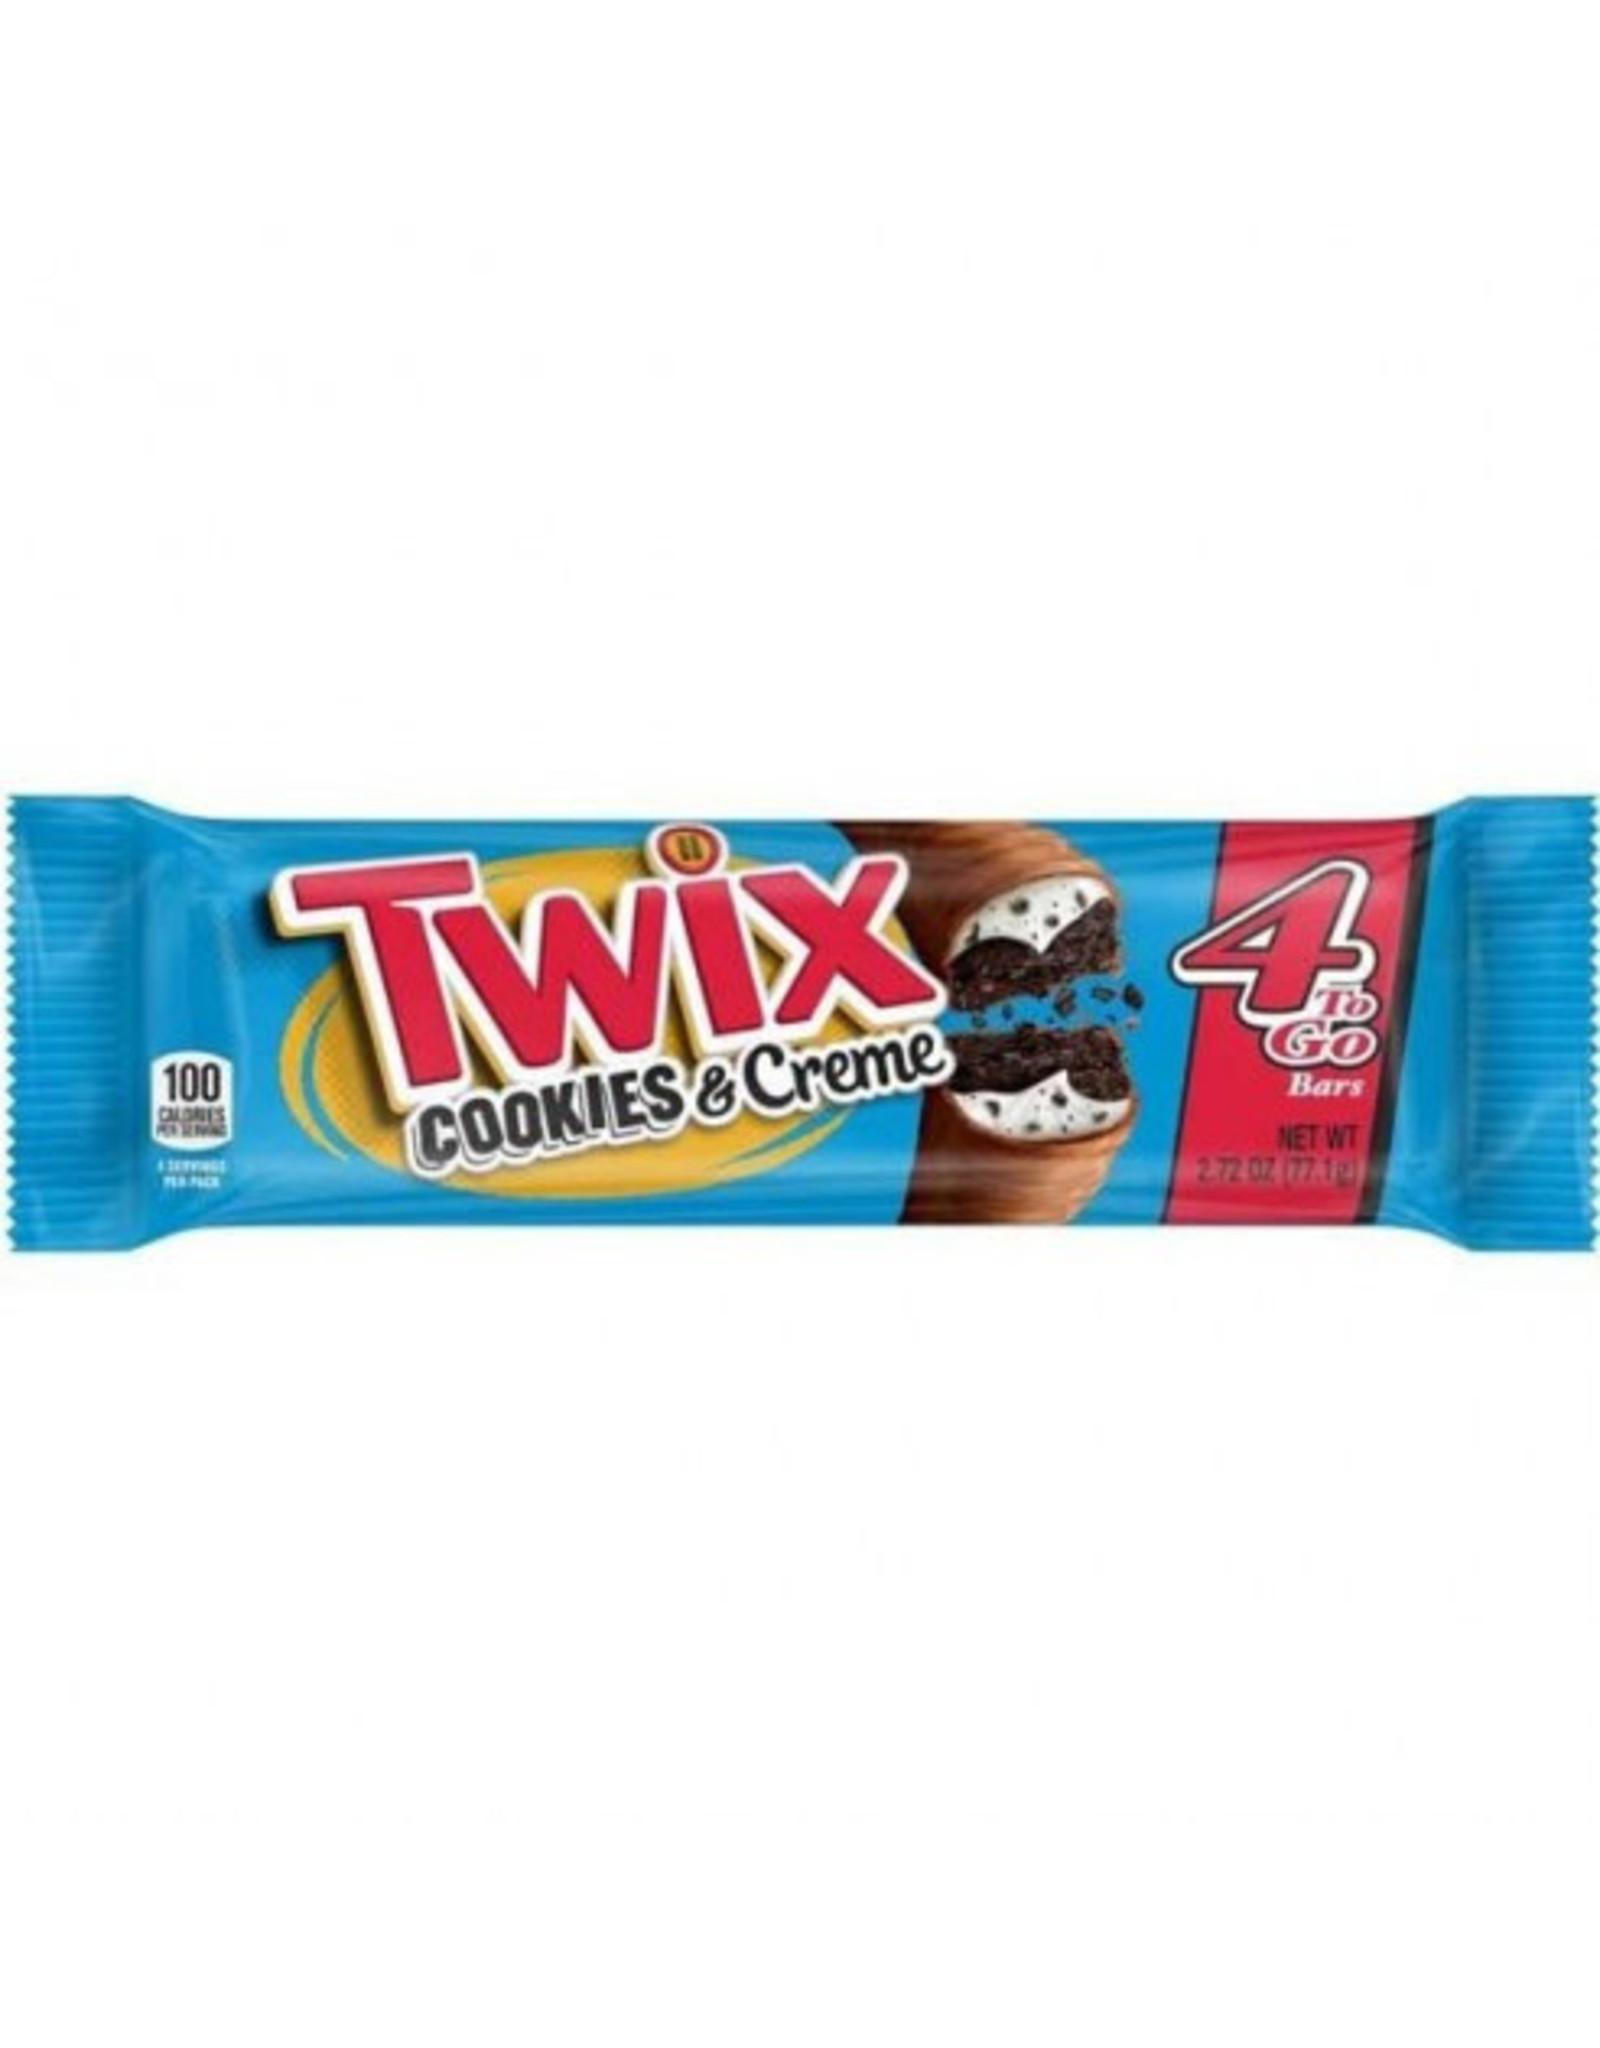 Twix Cookies & Creme - Share Size - 4 bars - 77g